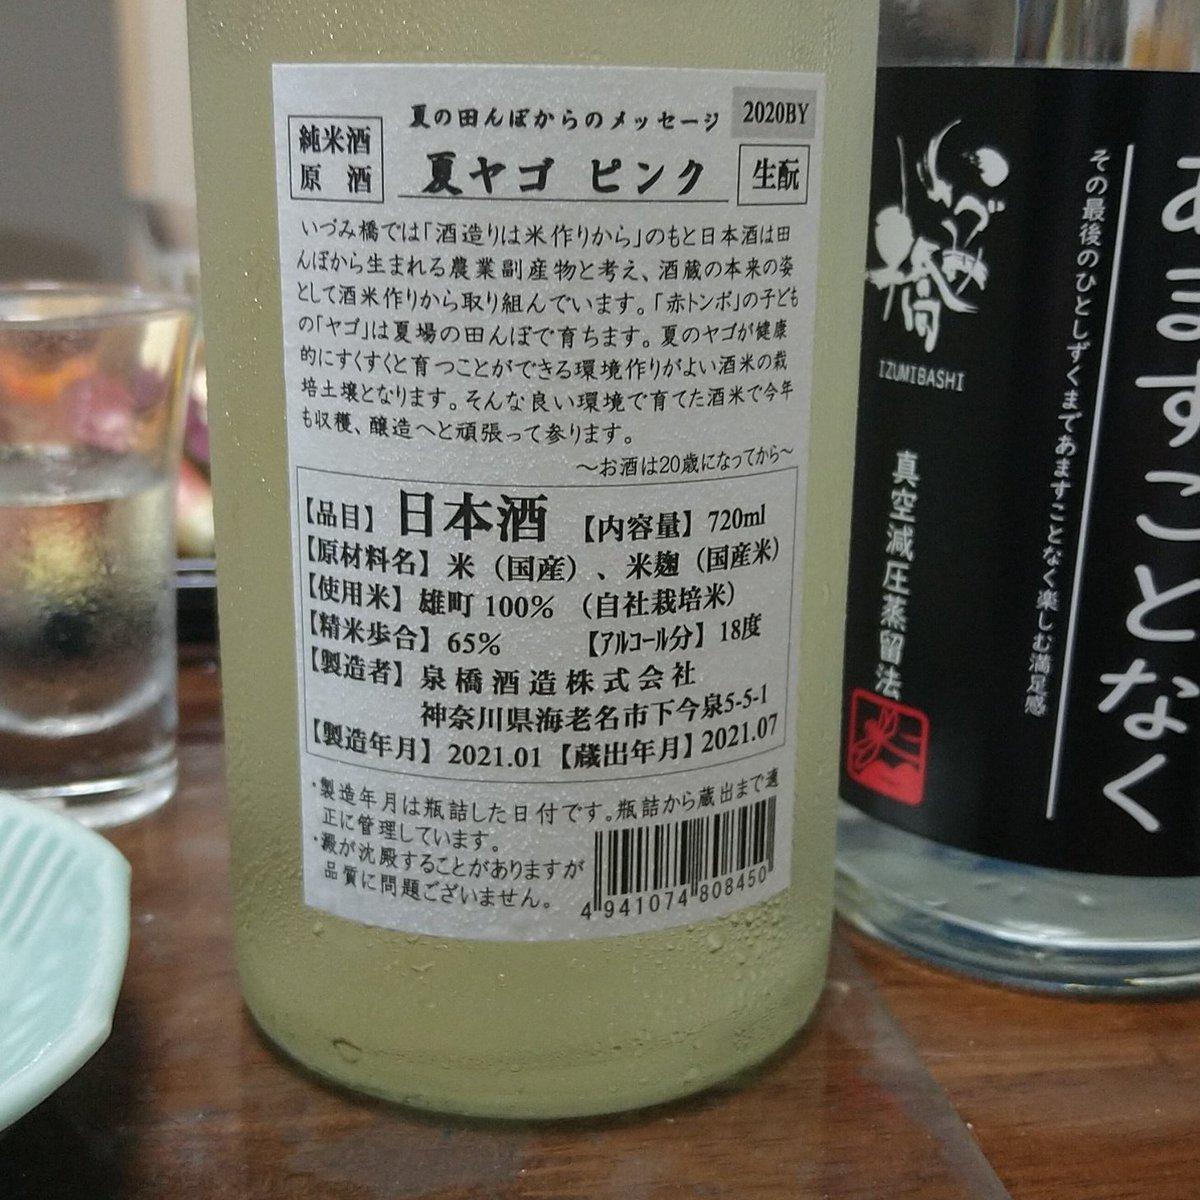 test ツイッターメディア - @Rice336 神奈川海老名の泉橋酒造の夏ヤゴピンクです。 https://t.co/2Pm9gmxD2a